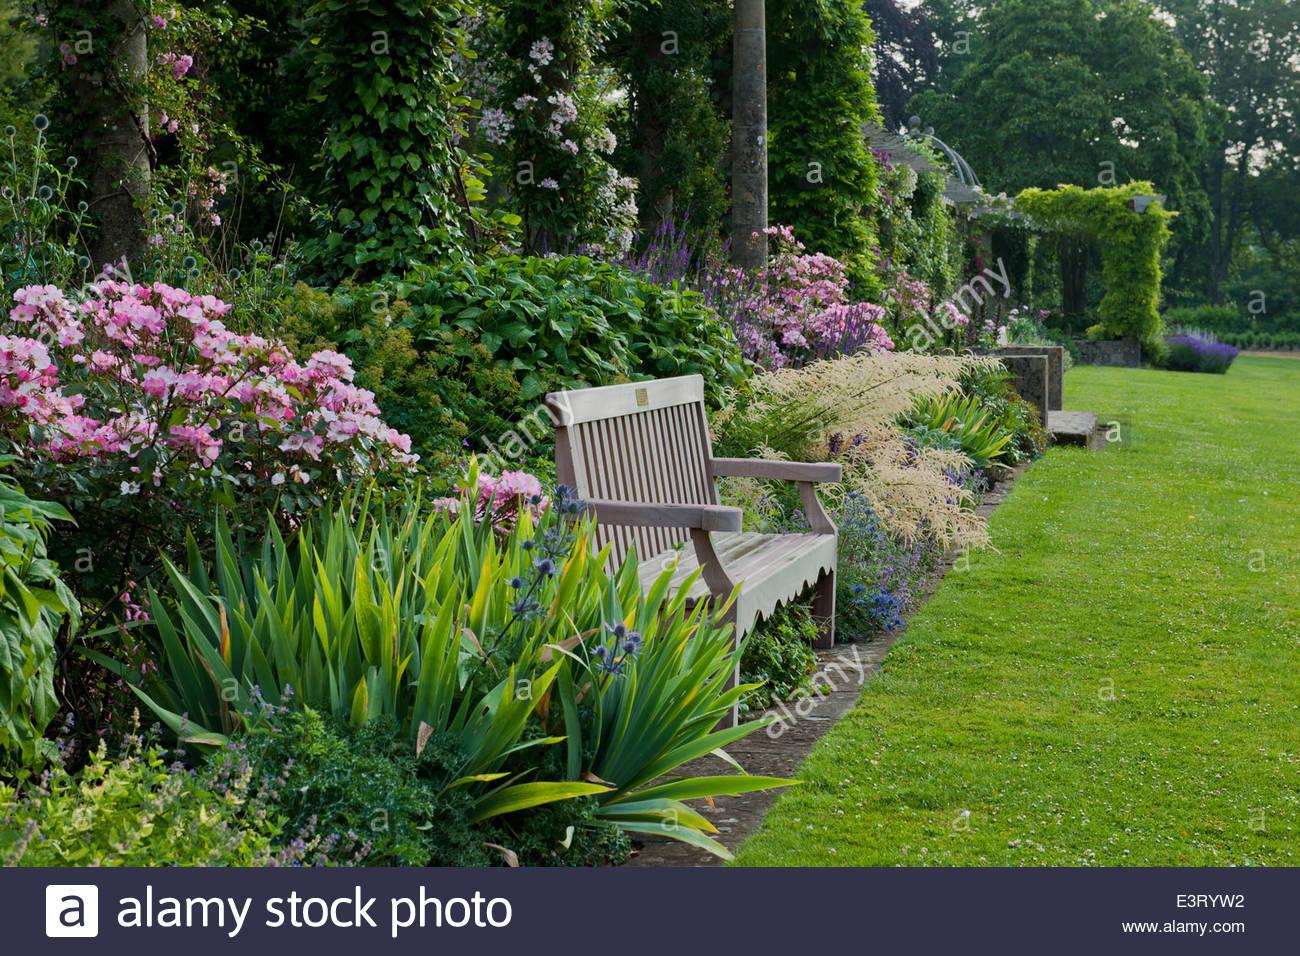 holzbank sommer grenze iris pergola stein rasen juni west dean sussex stauden sonne sonnig bl te. Black Bedroom Furniture Sets. Home Design Ideas